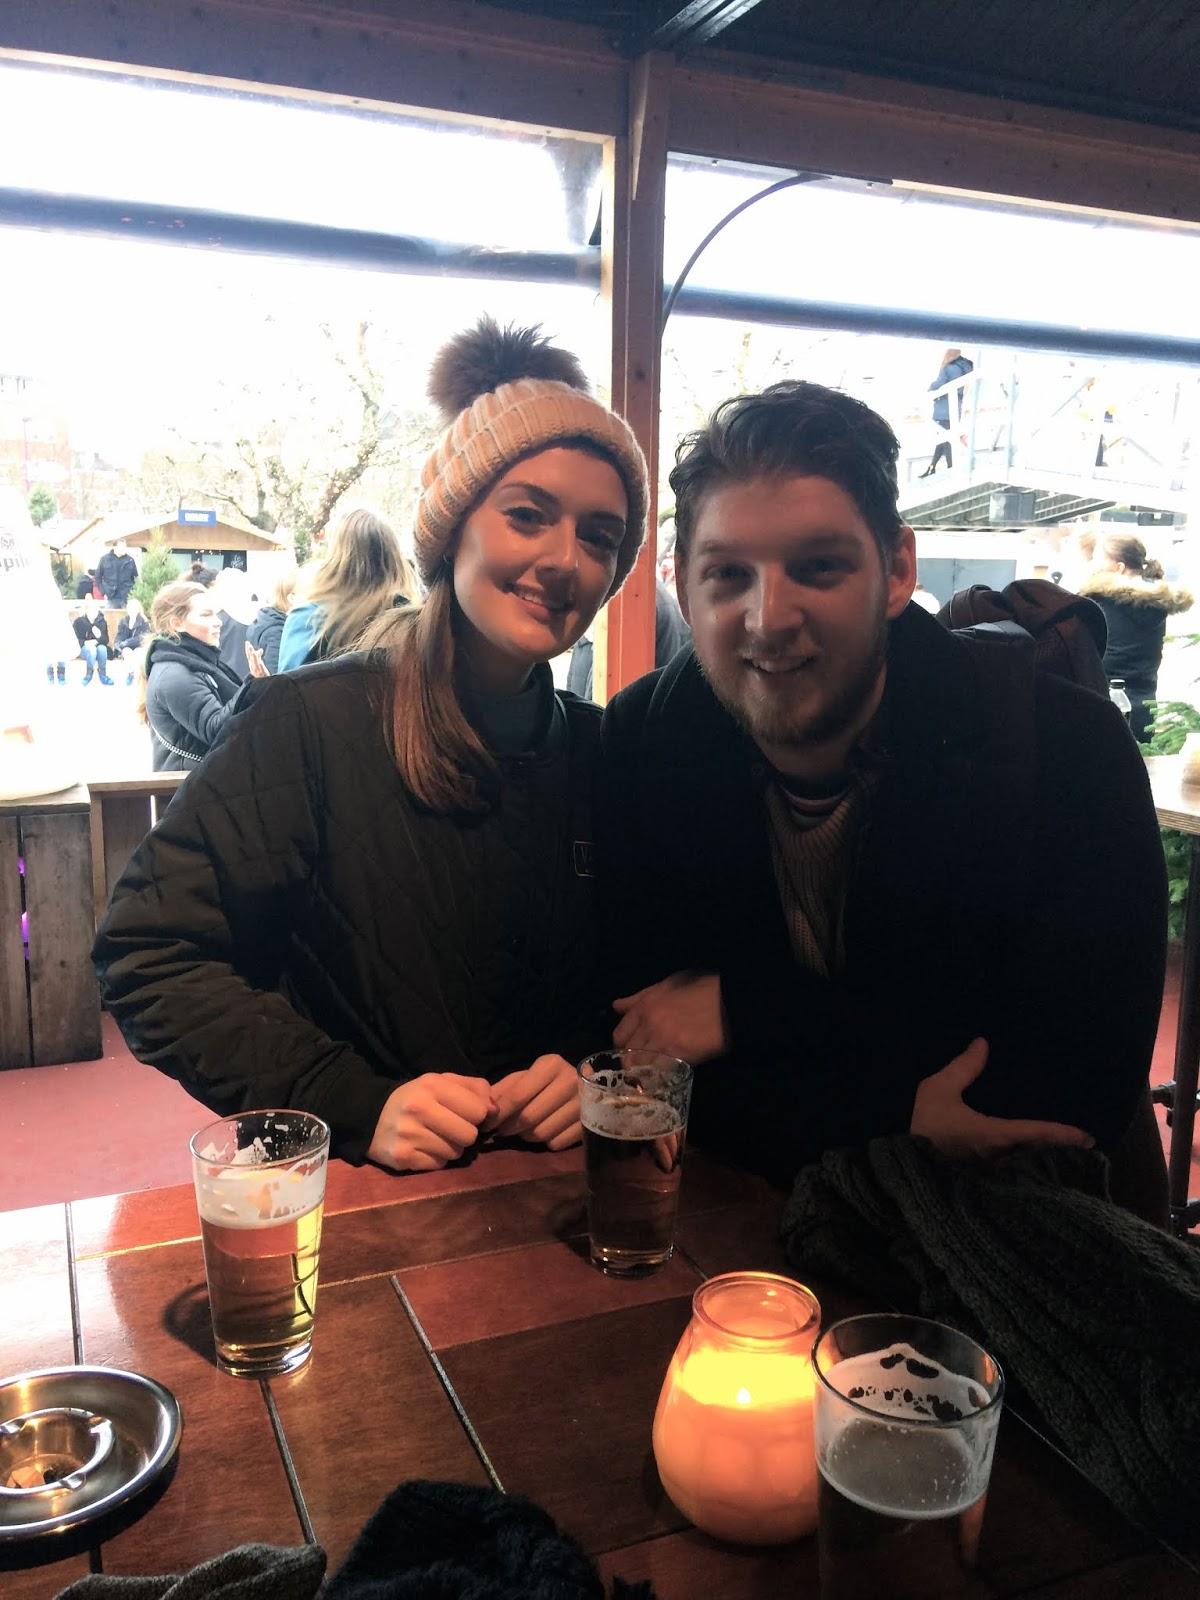 Best friends enjoying a beer in Amsterdam